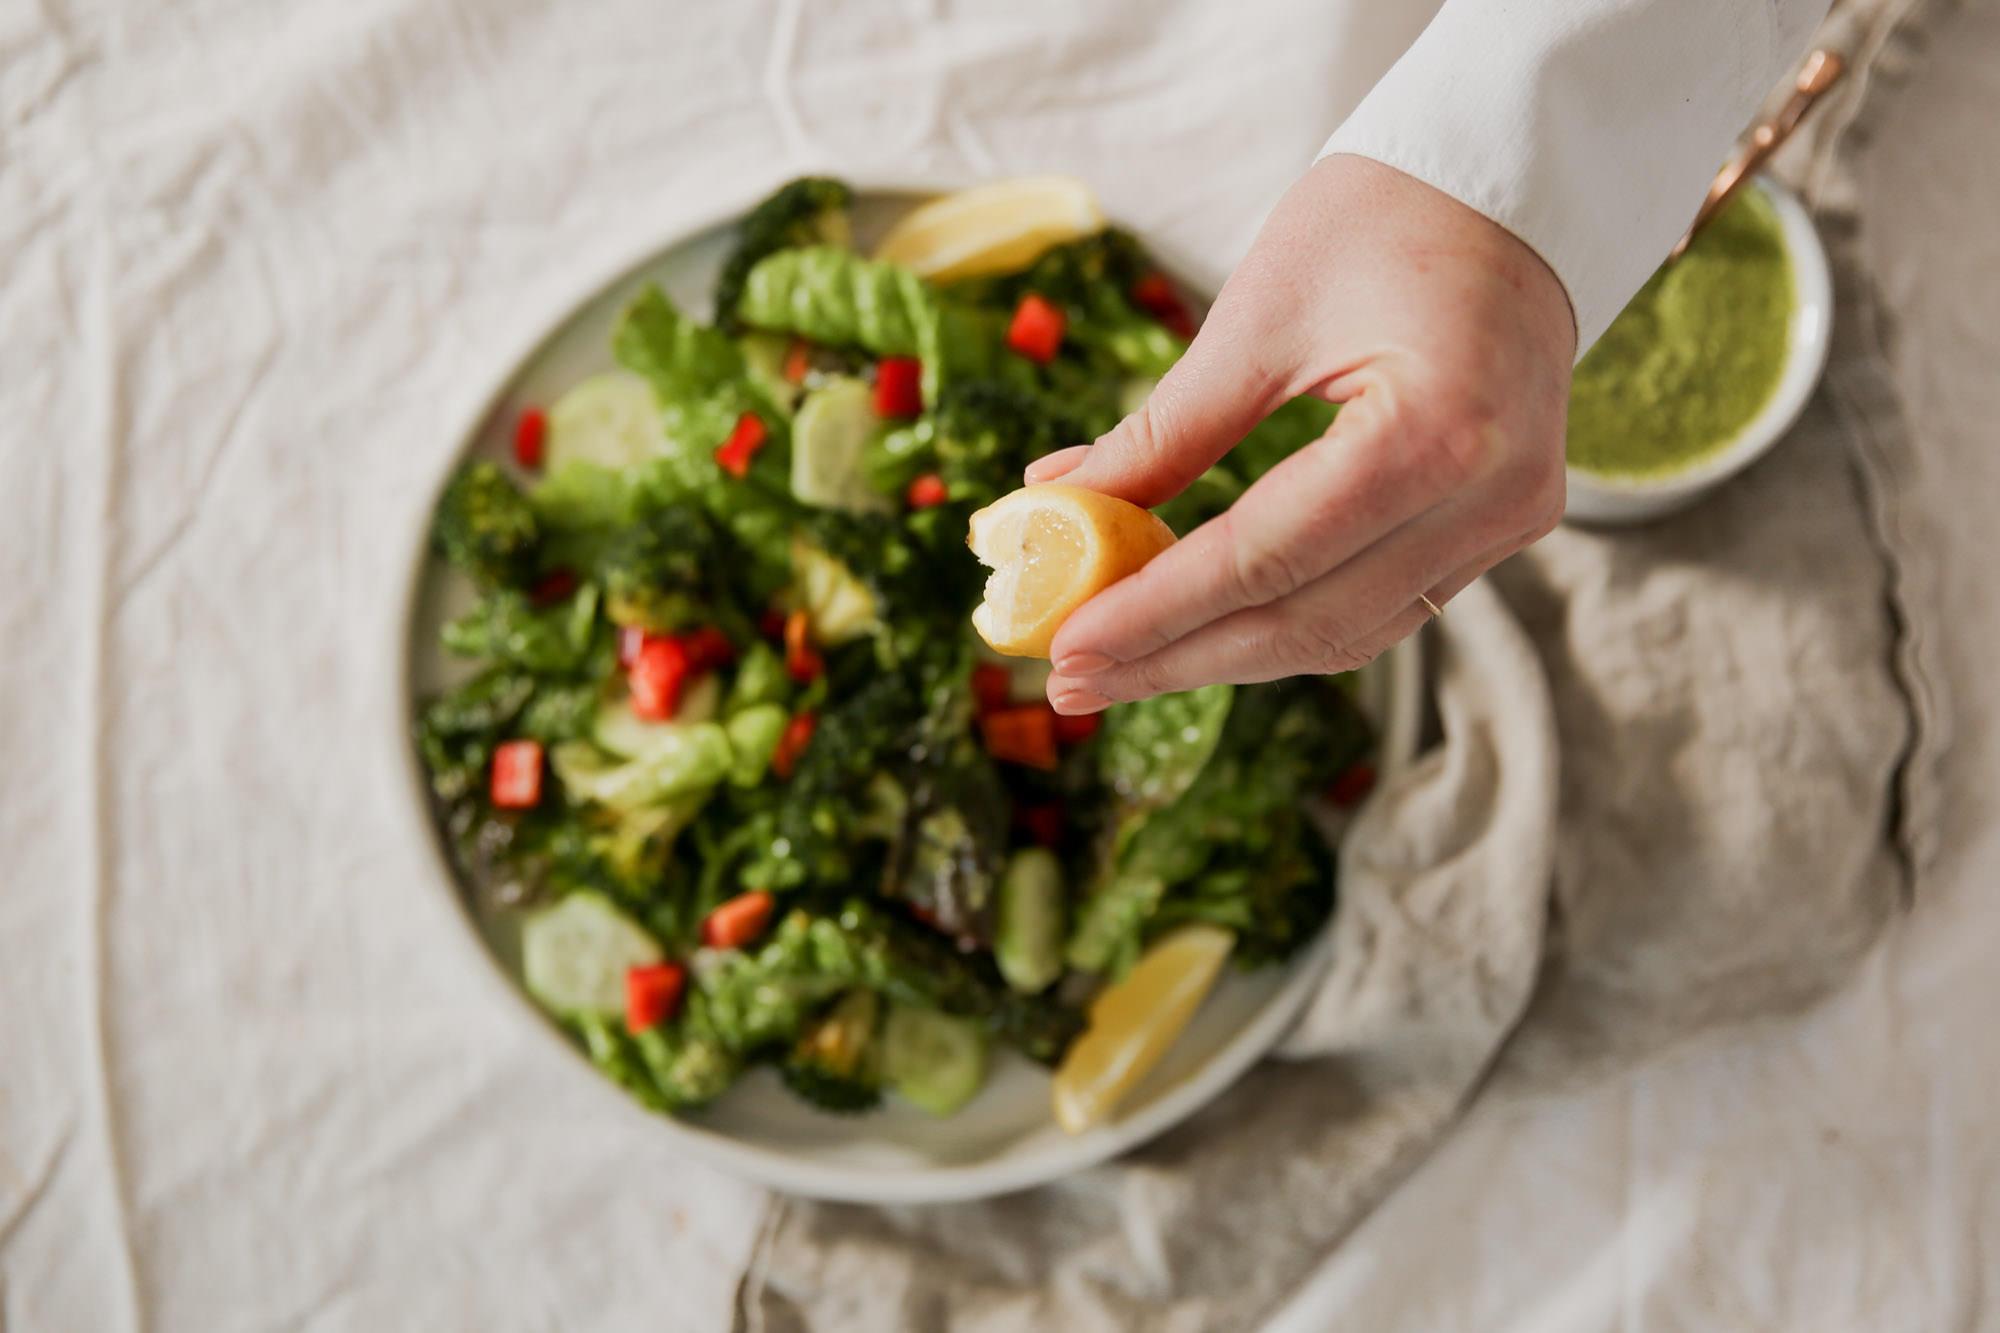 Spritzing Fresh Lemon On Salad